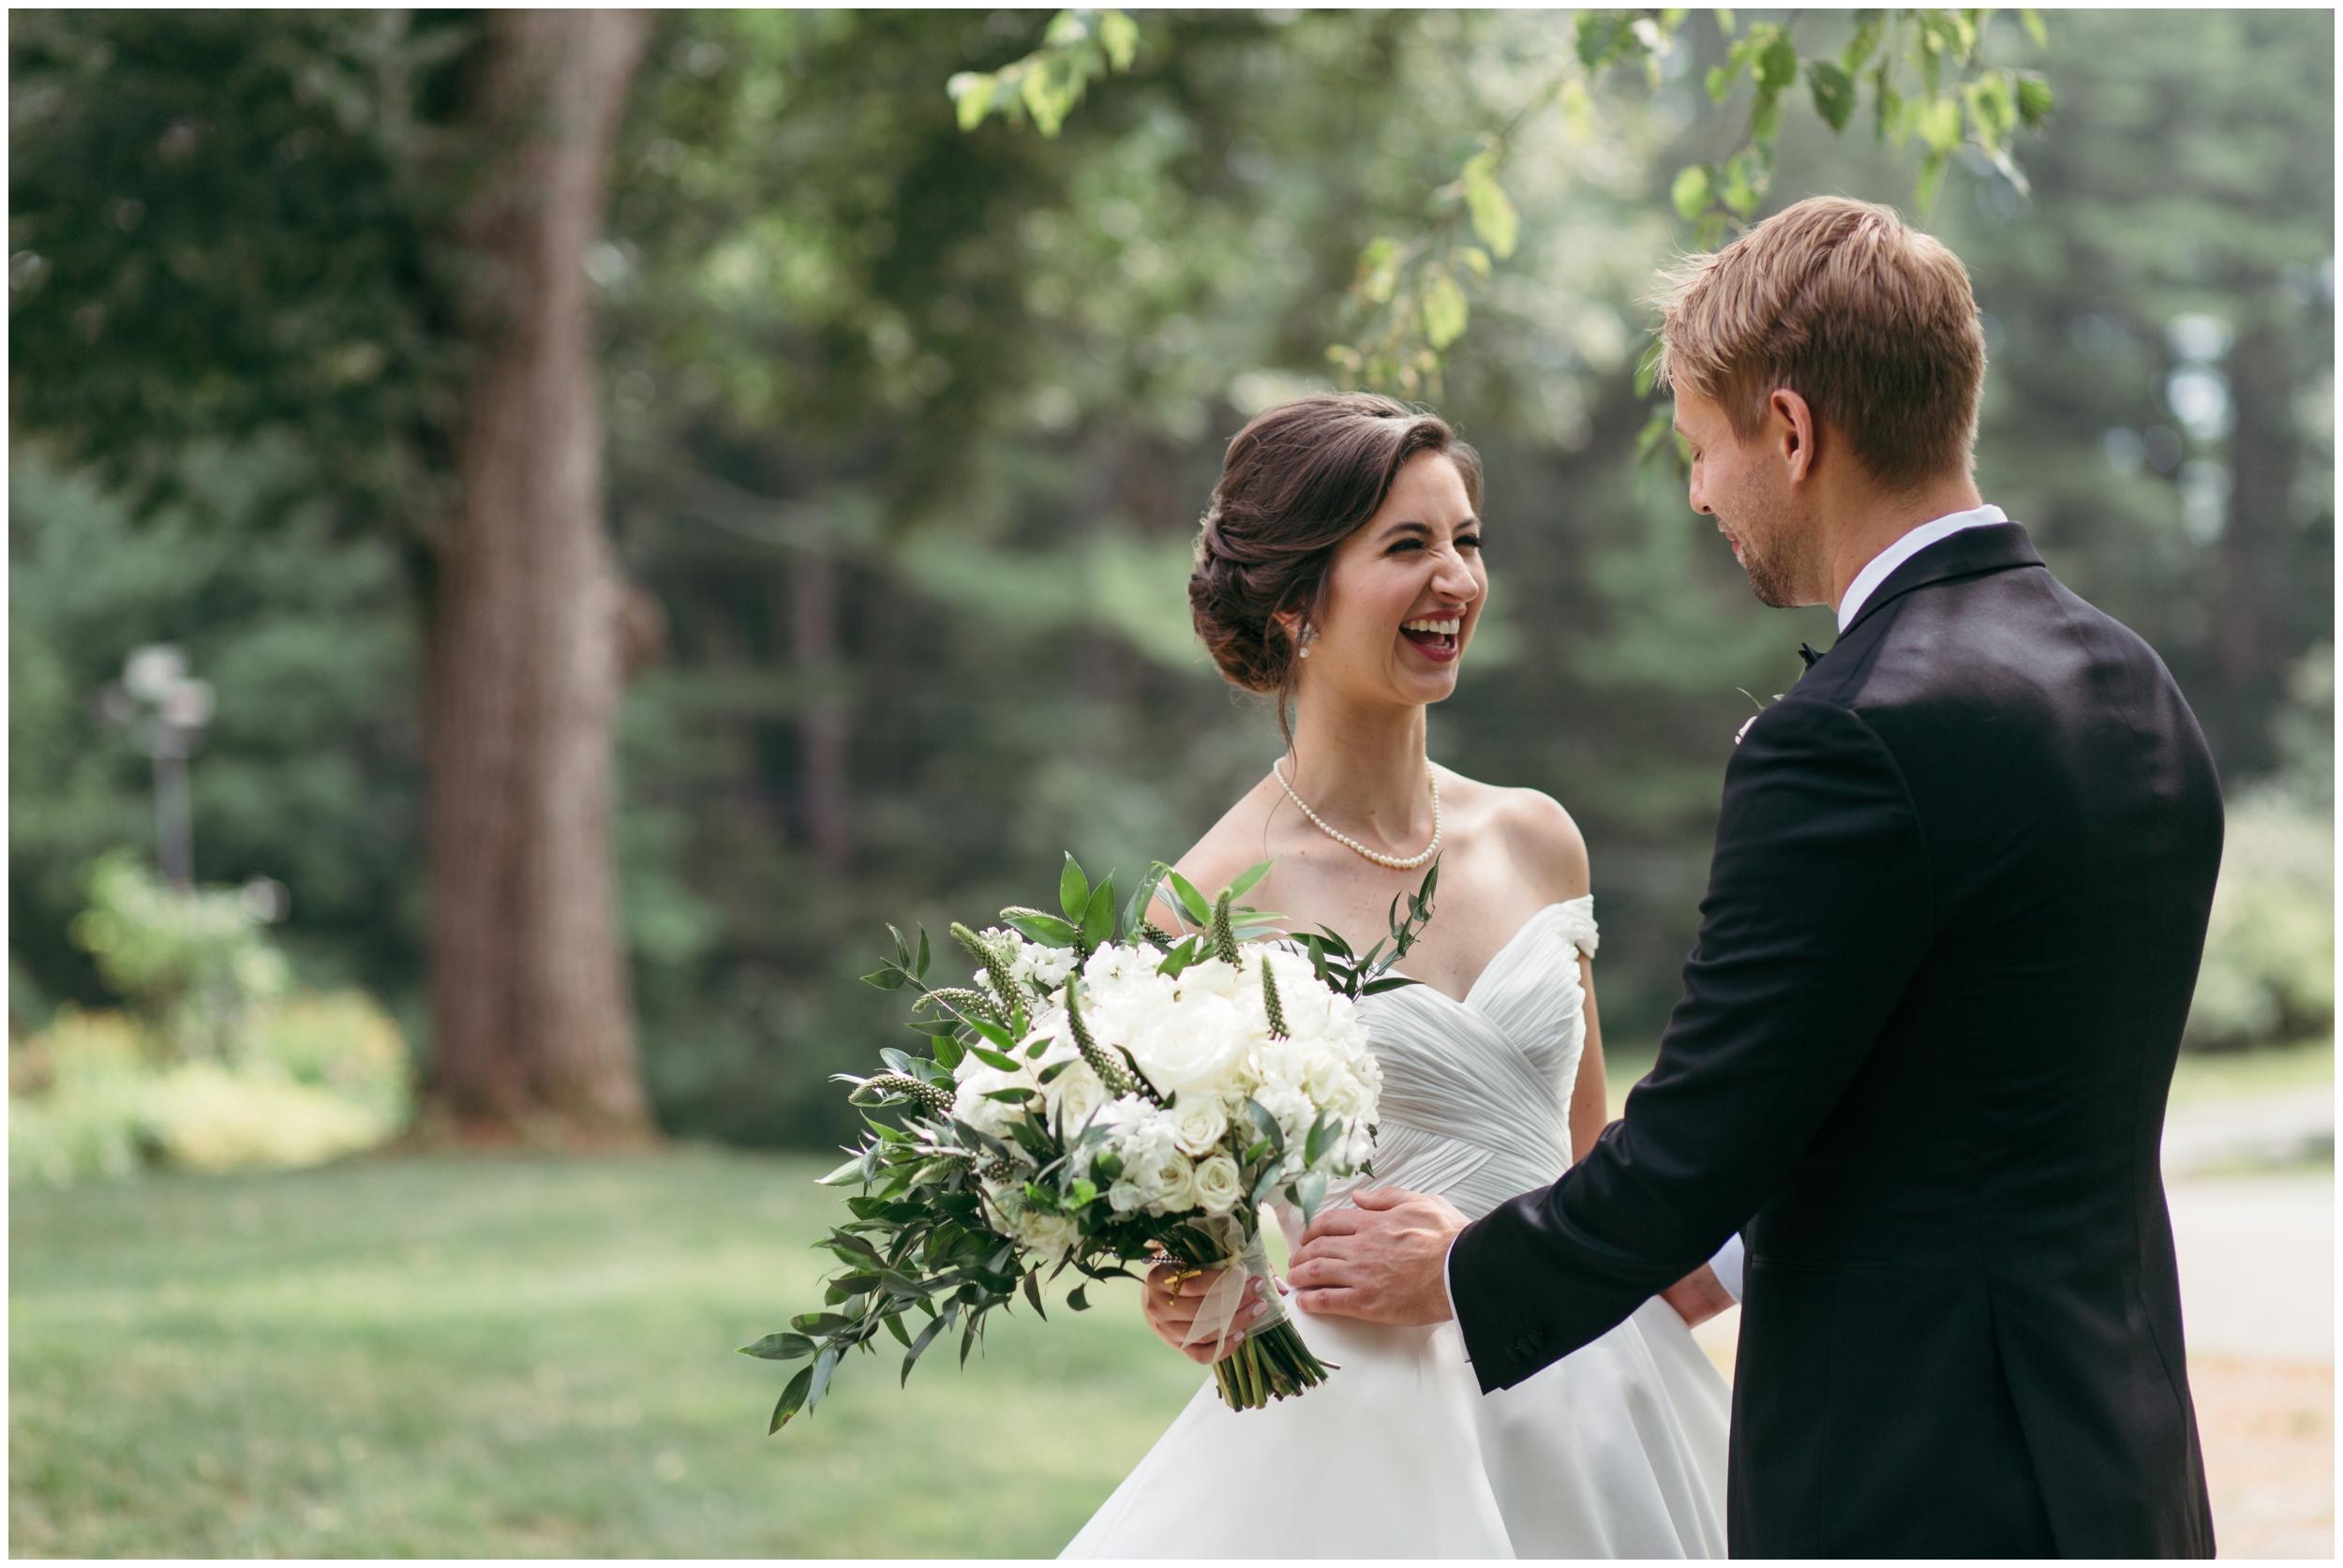 Willowdale-Estate-Wedding-Bailey-Q-Photo-Boston-Wedding-Photographer-012.JPG